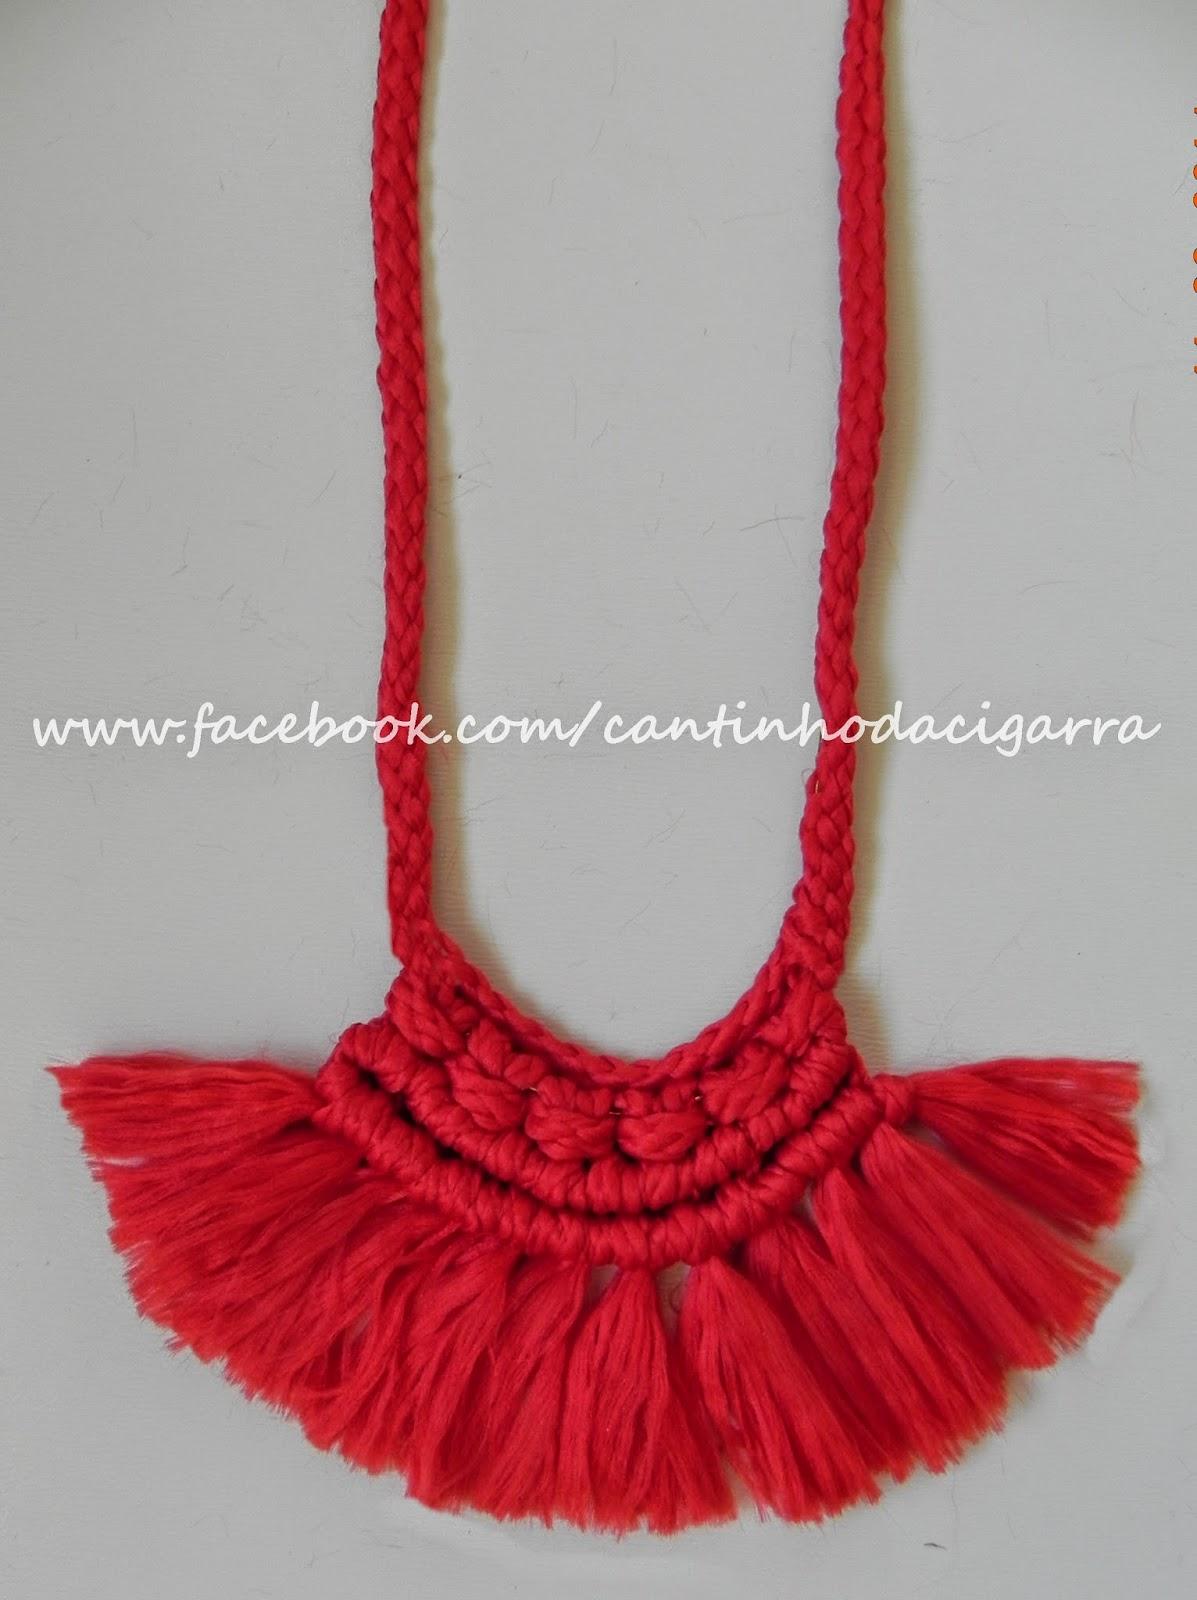 www.facebook.com/cantinhodacigarra